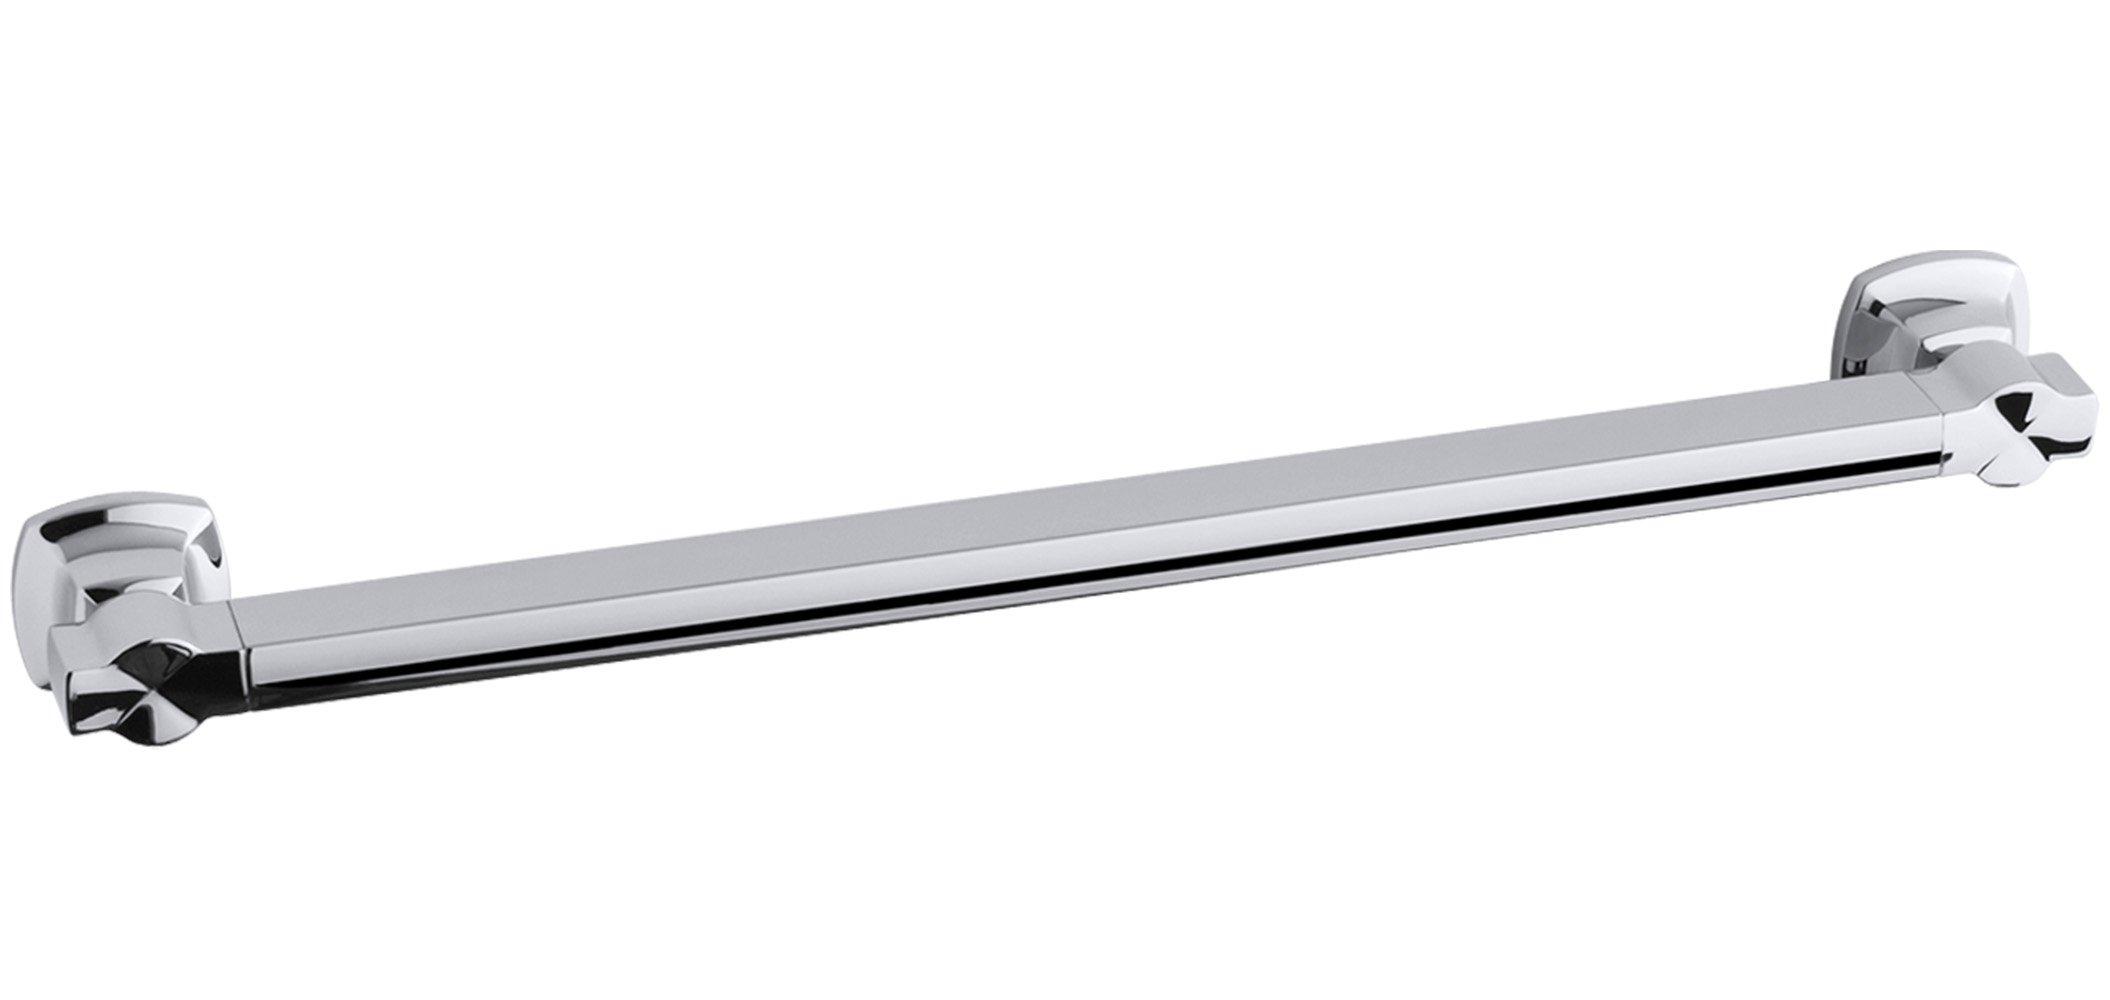 Kohler K-11883-S Margaux 24'' Grab Bar, Polished Stainless